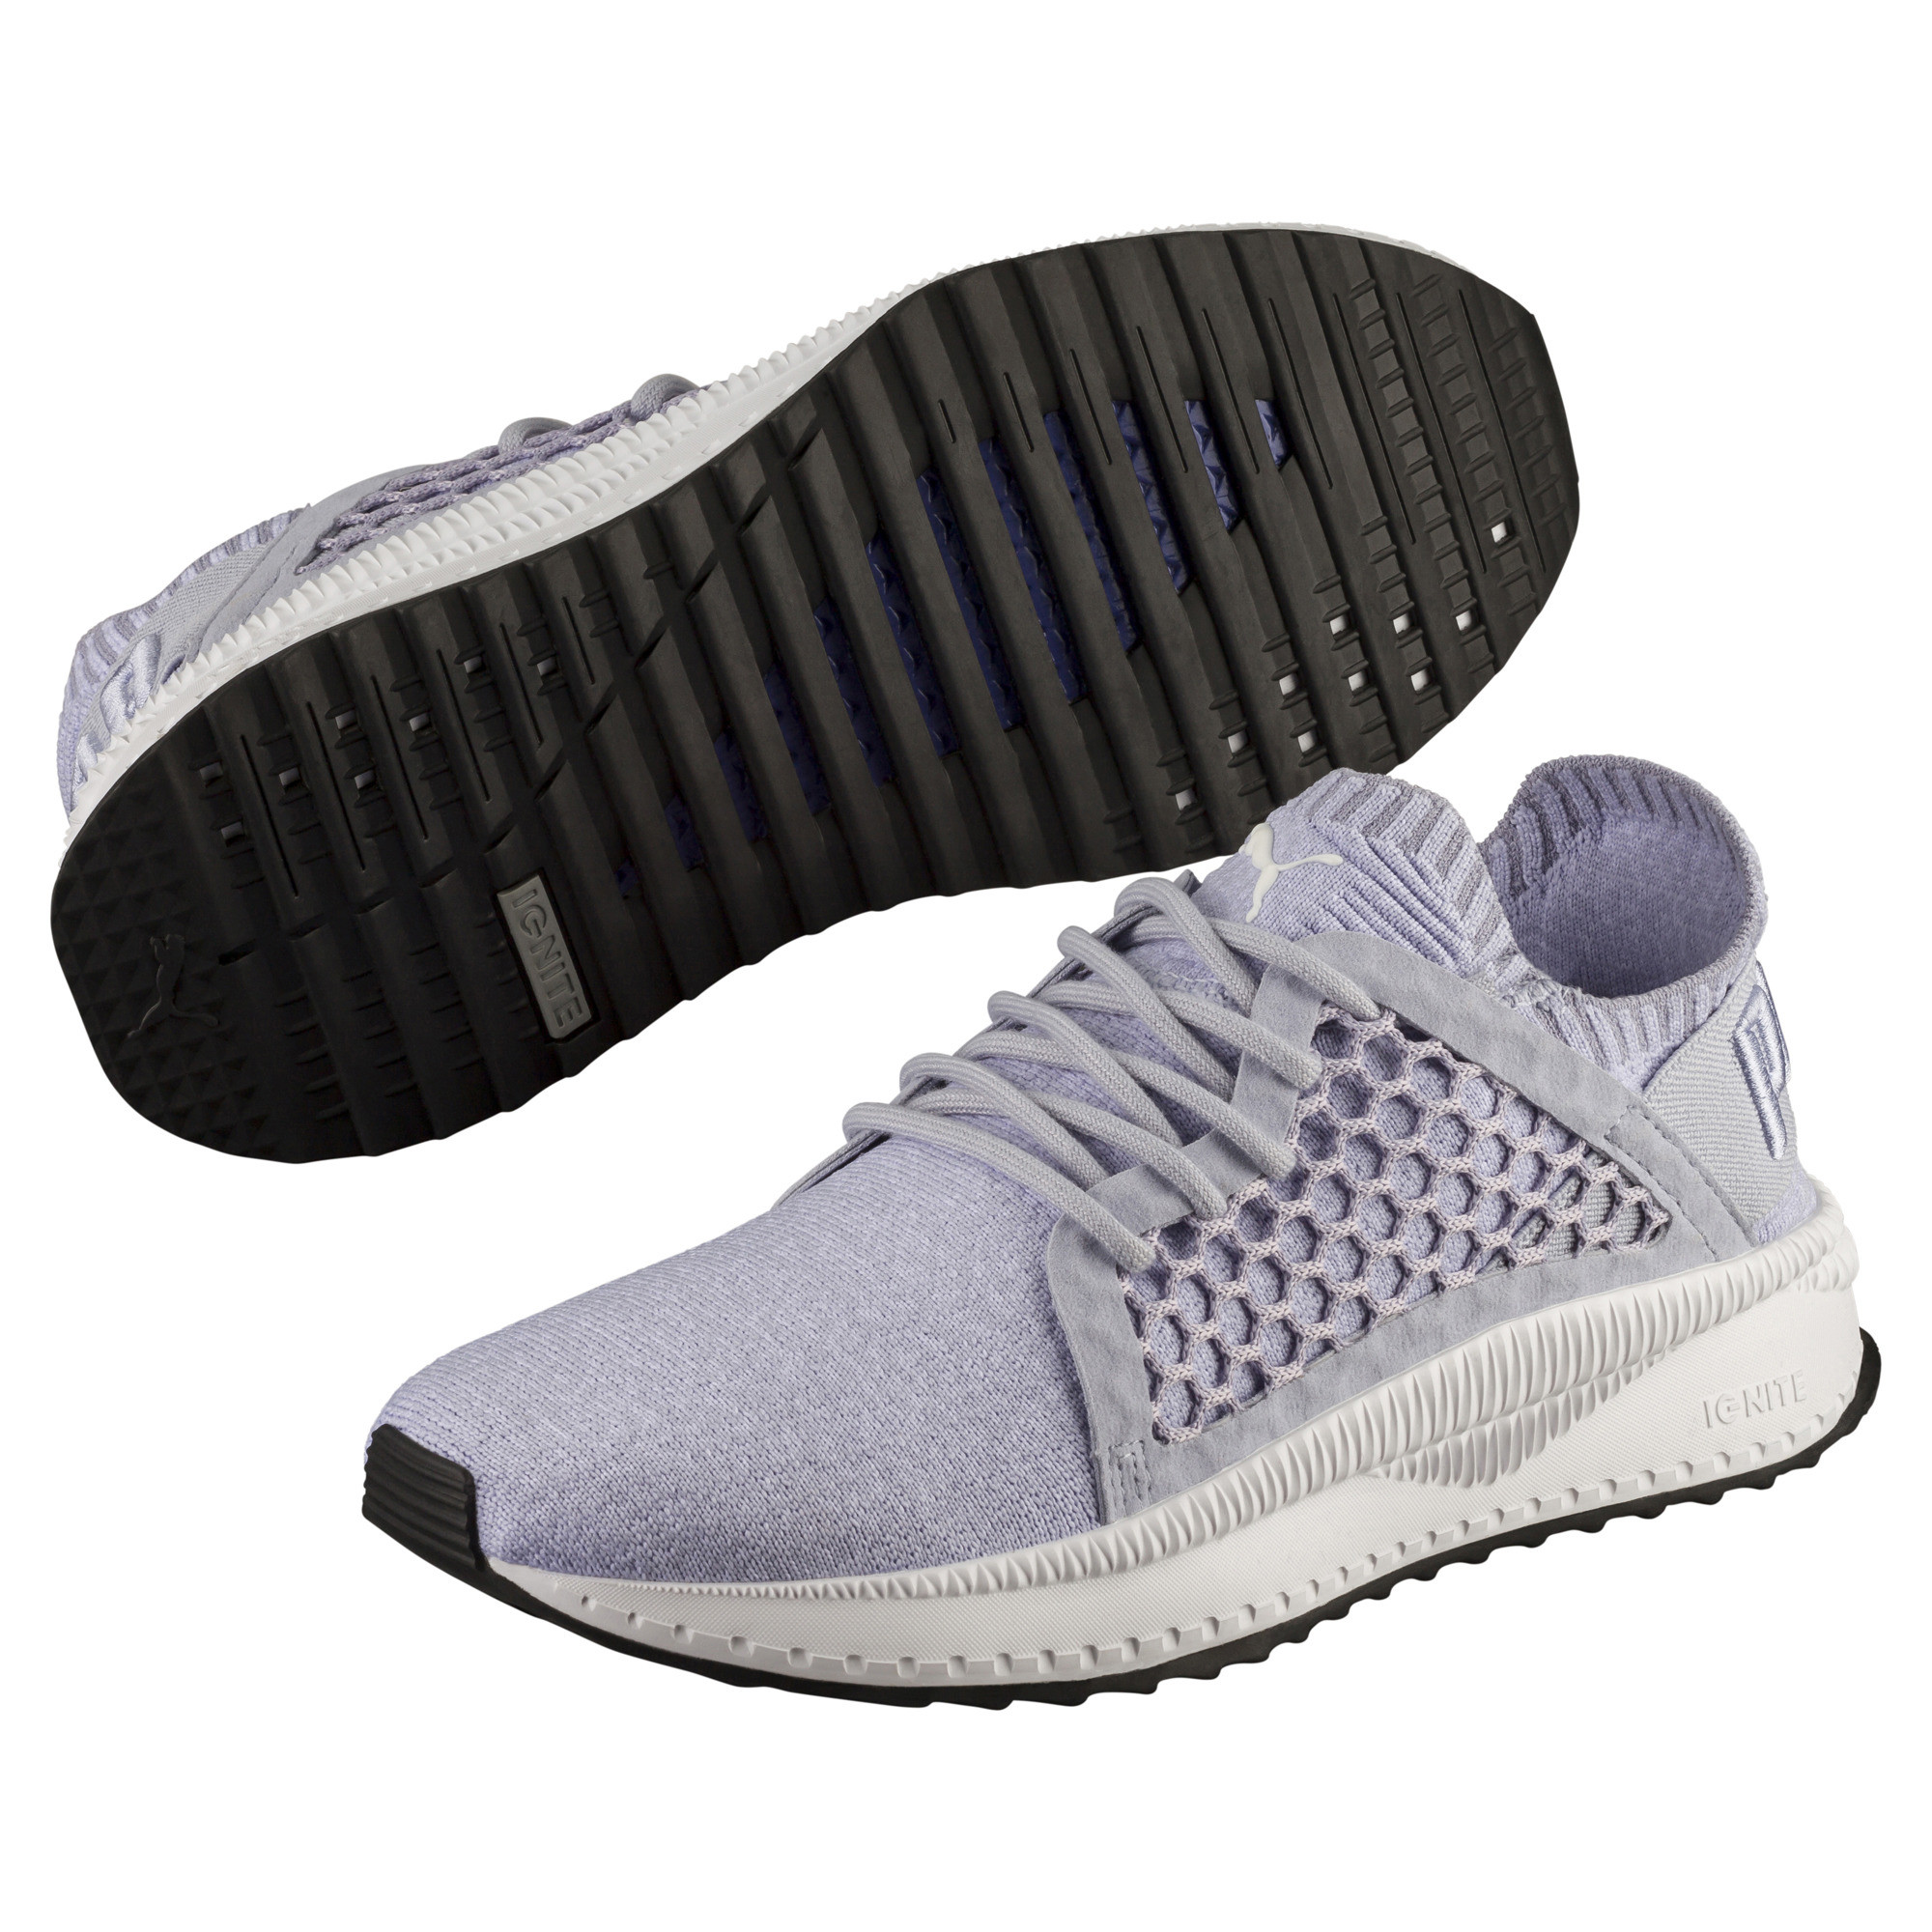 PUMA-TSUGI-NETFIT-evoKNIT-Sneaker-Frauen-Schuhe-Neu Indexbild 12